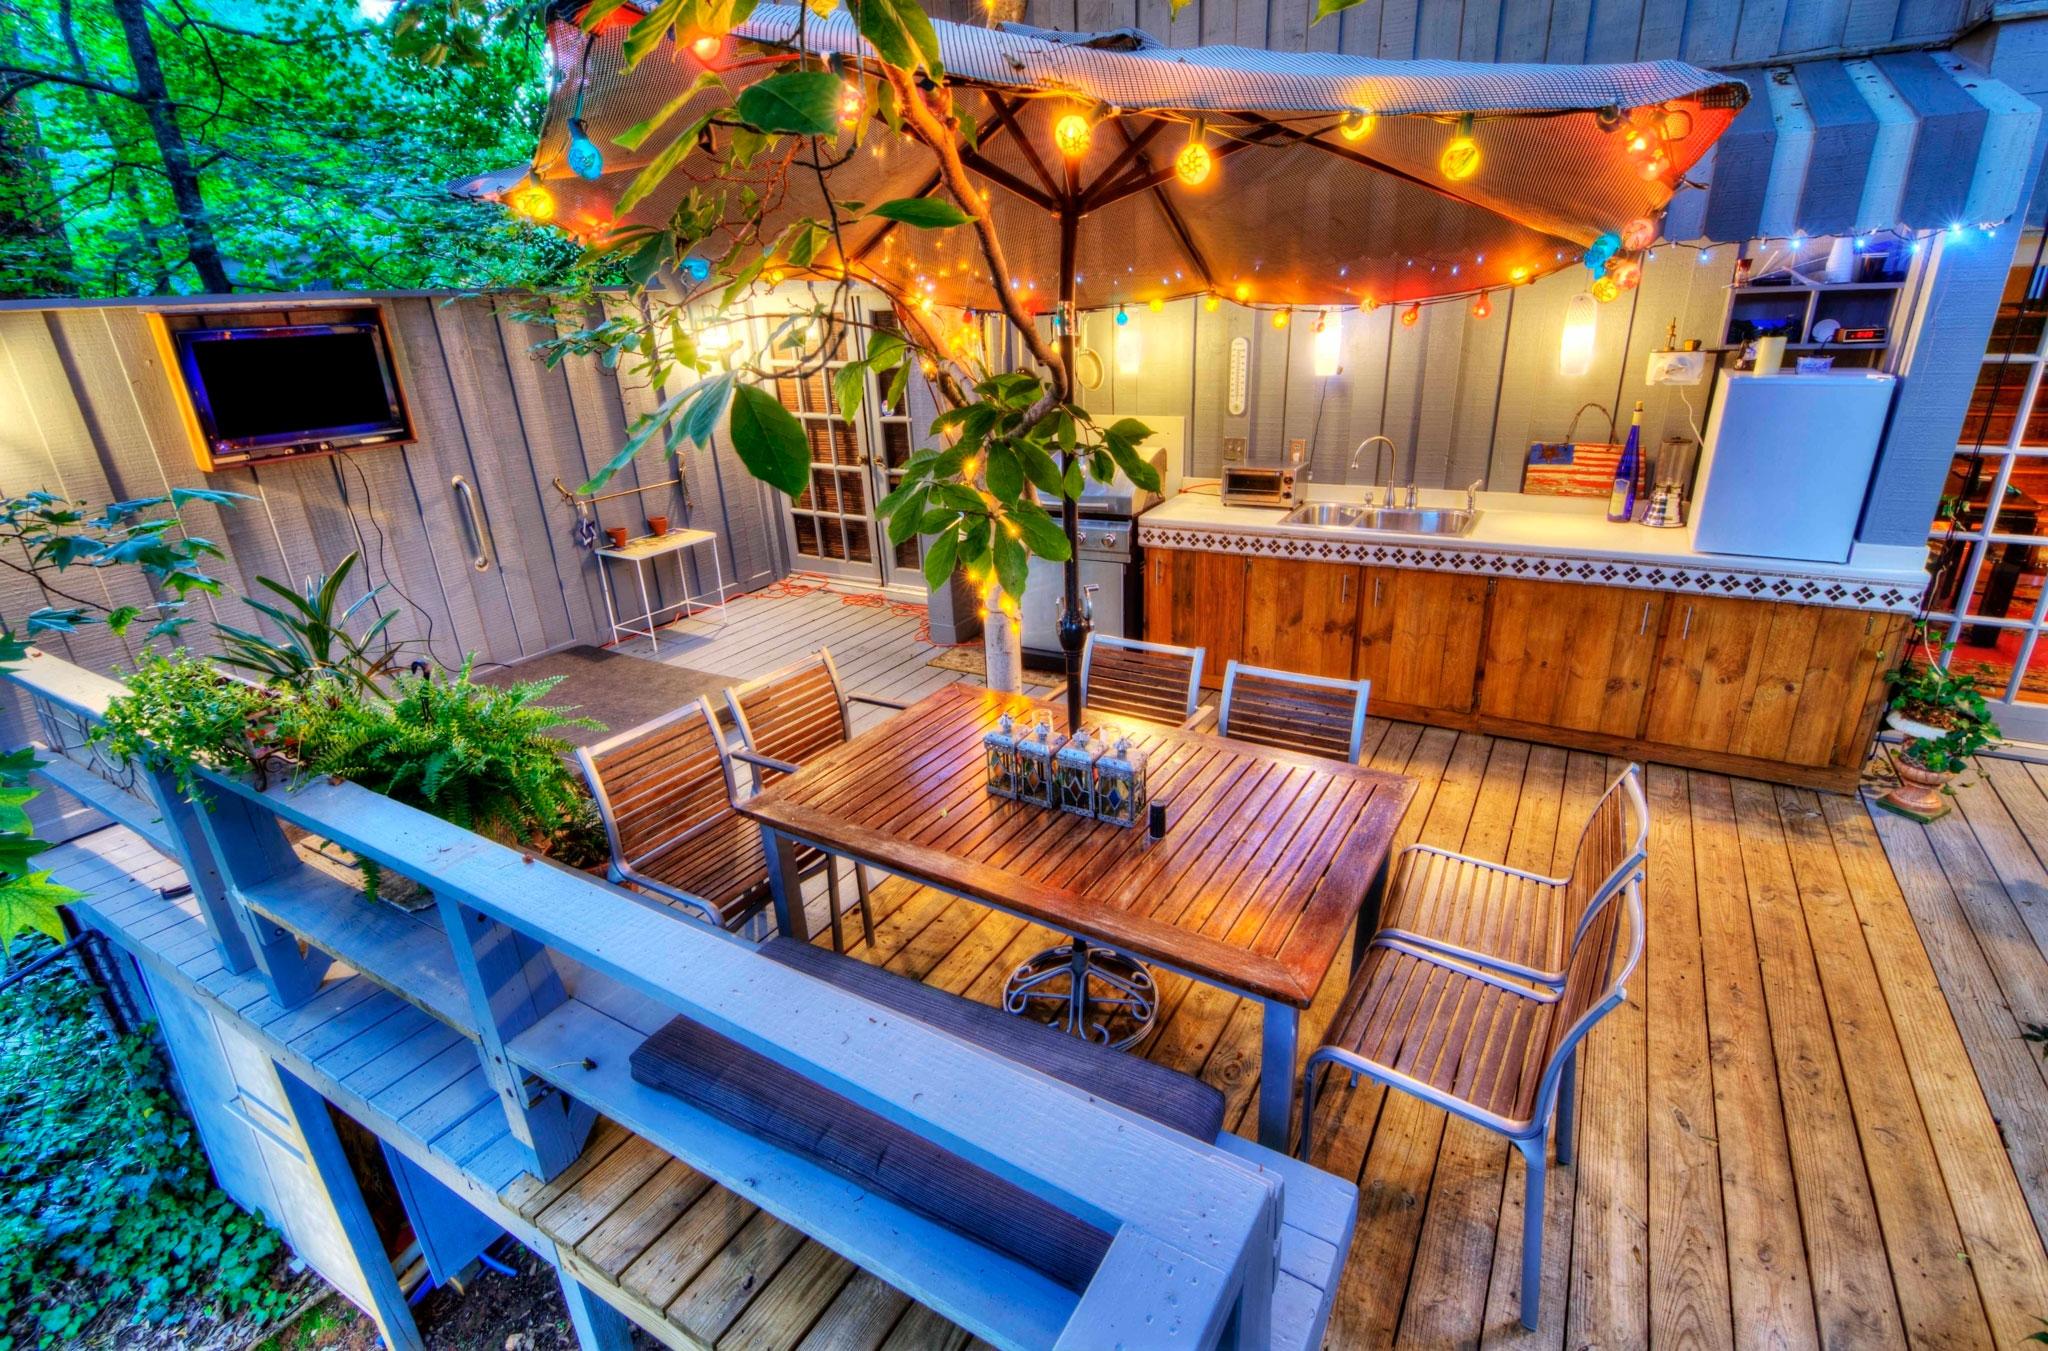 Toronto's most buzzworthy new patios\'s photo